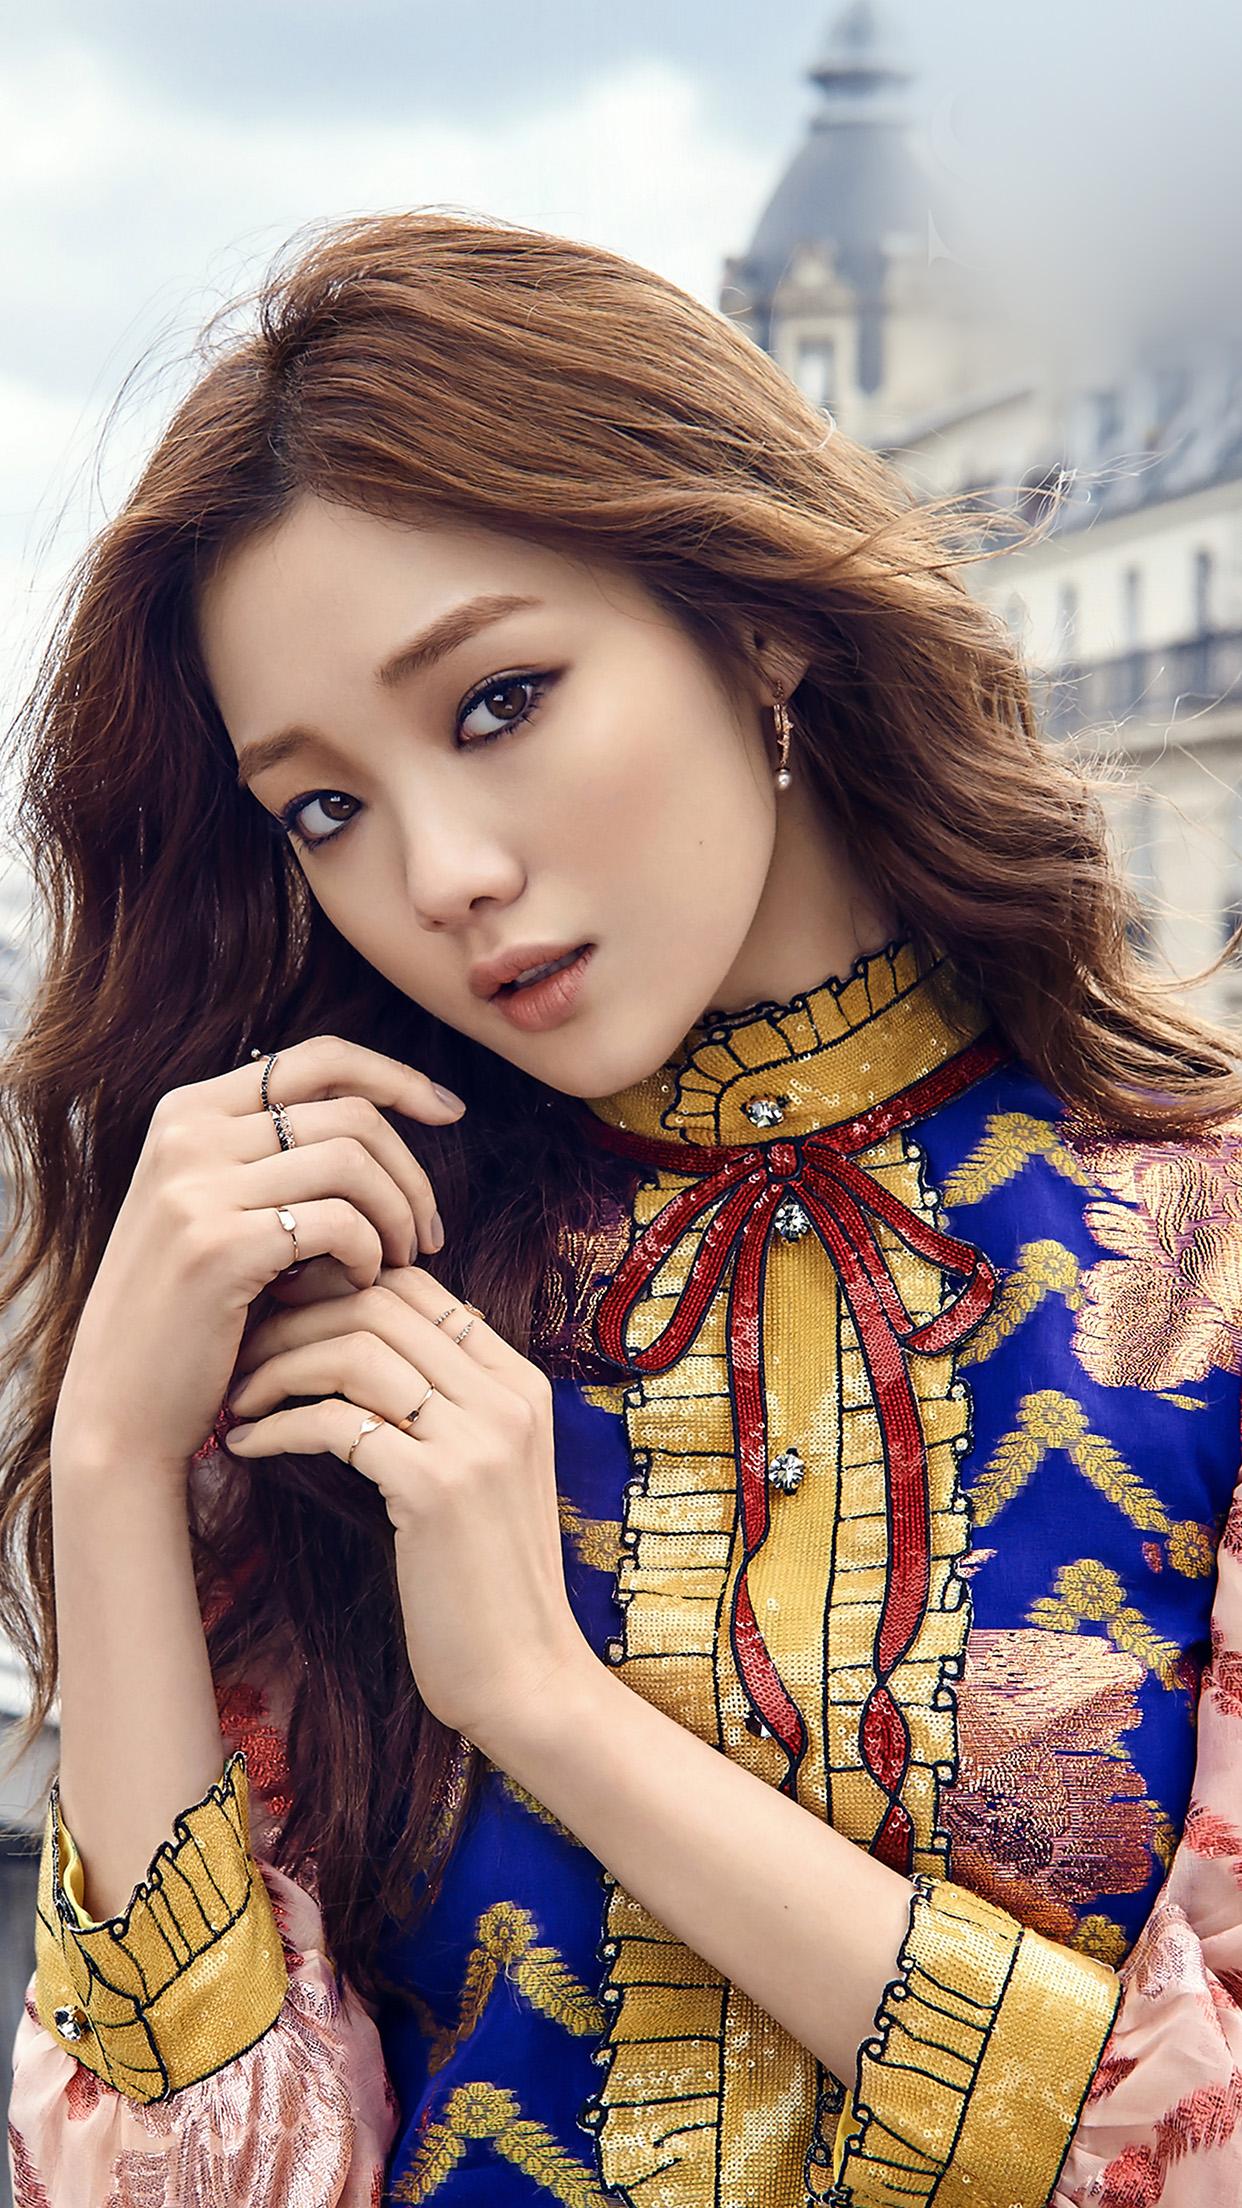 Simple Girl Wallpaper Com Papers Co Iphone Wallpaper Hk93 Lee Sunggyung Kpop